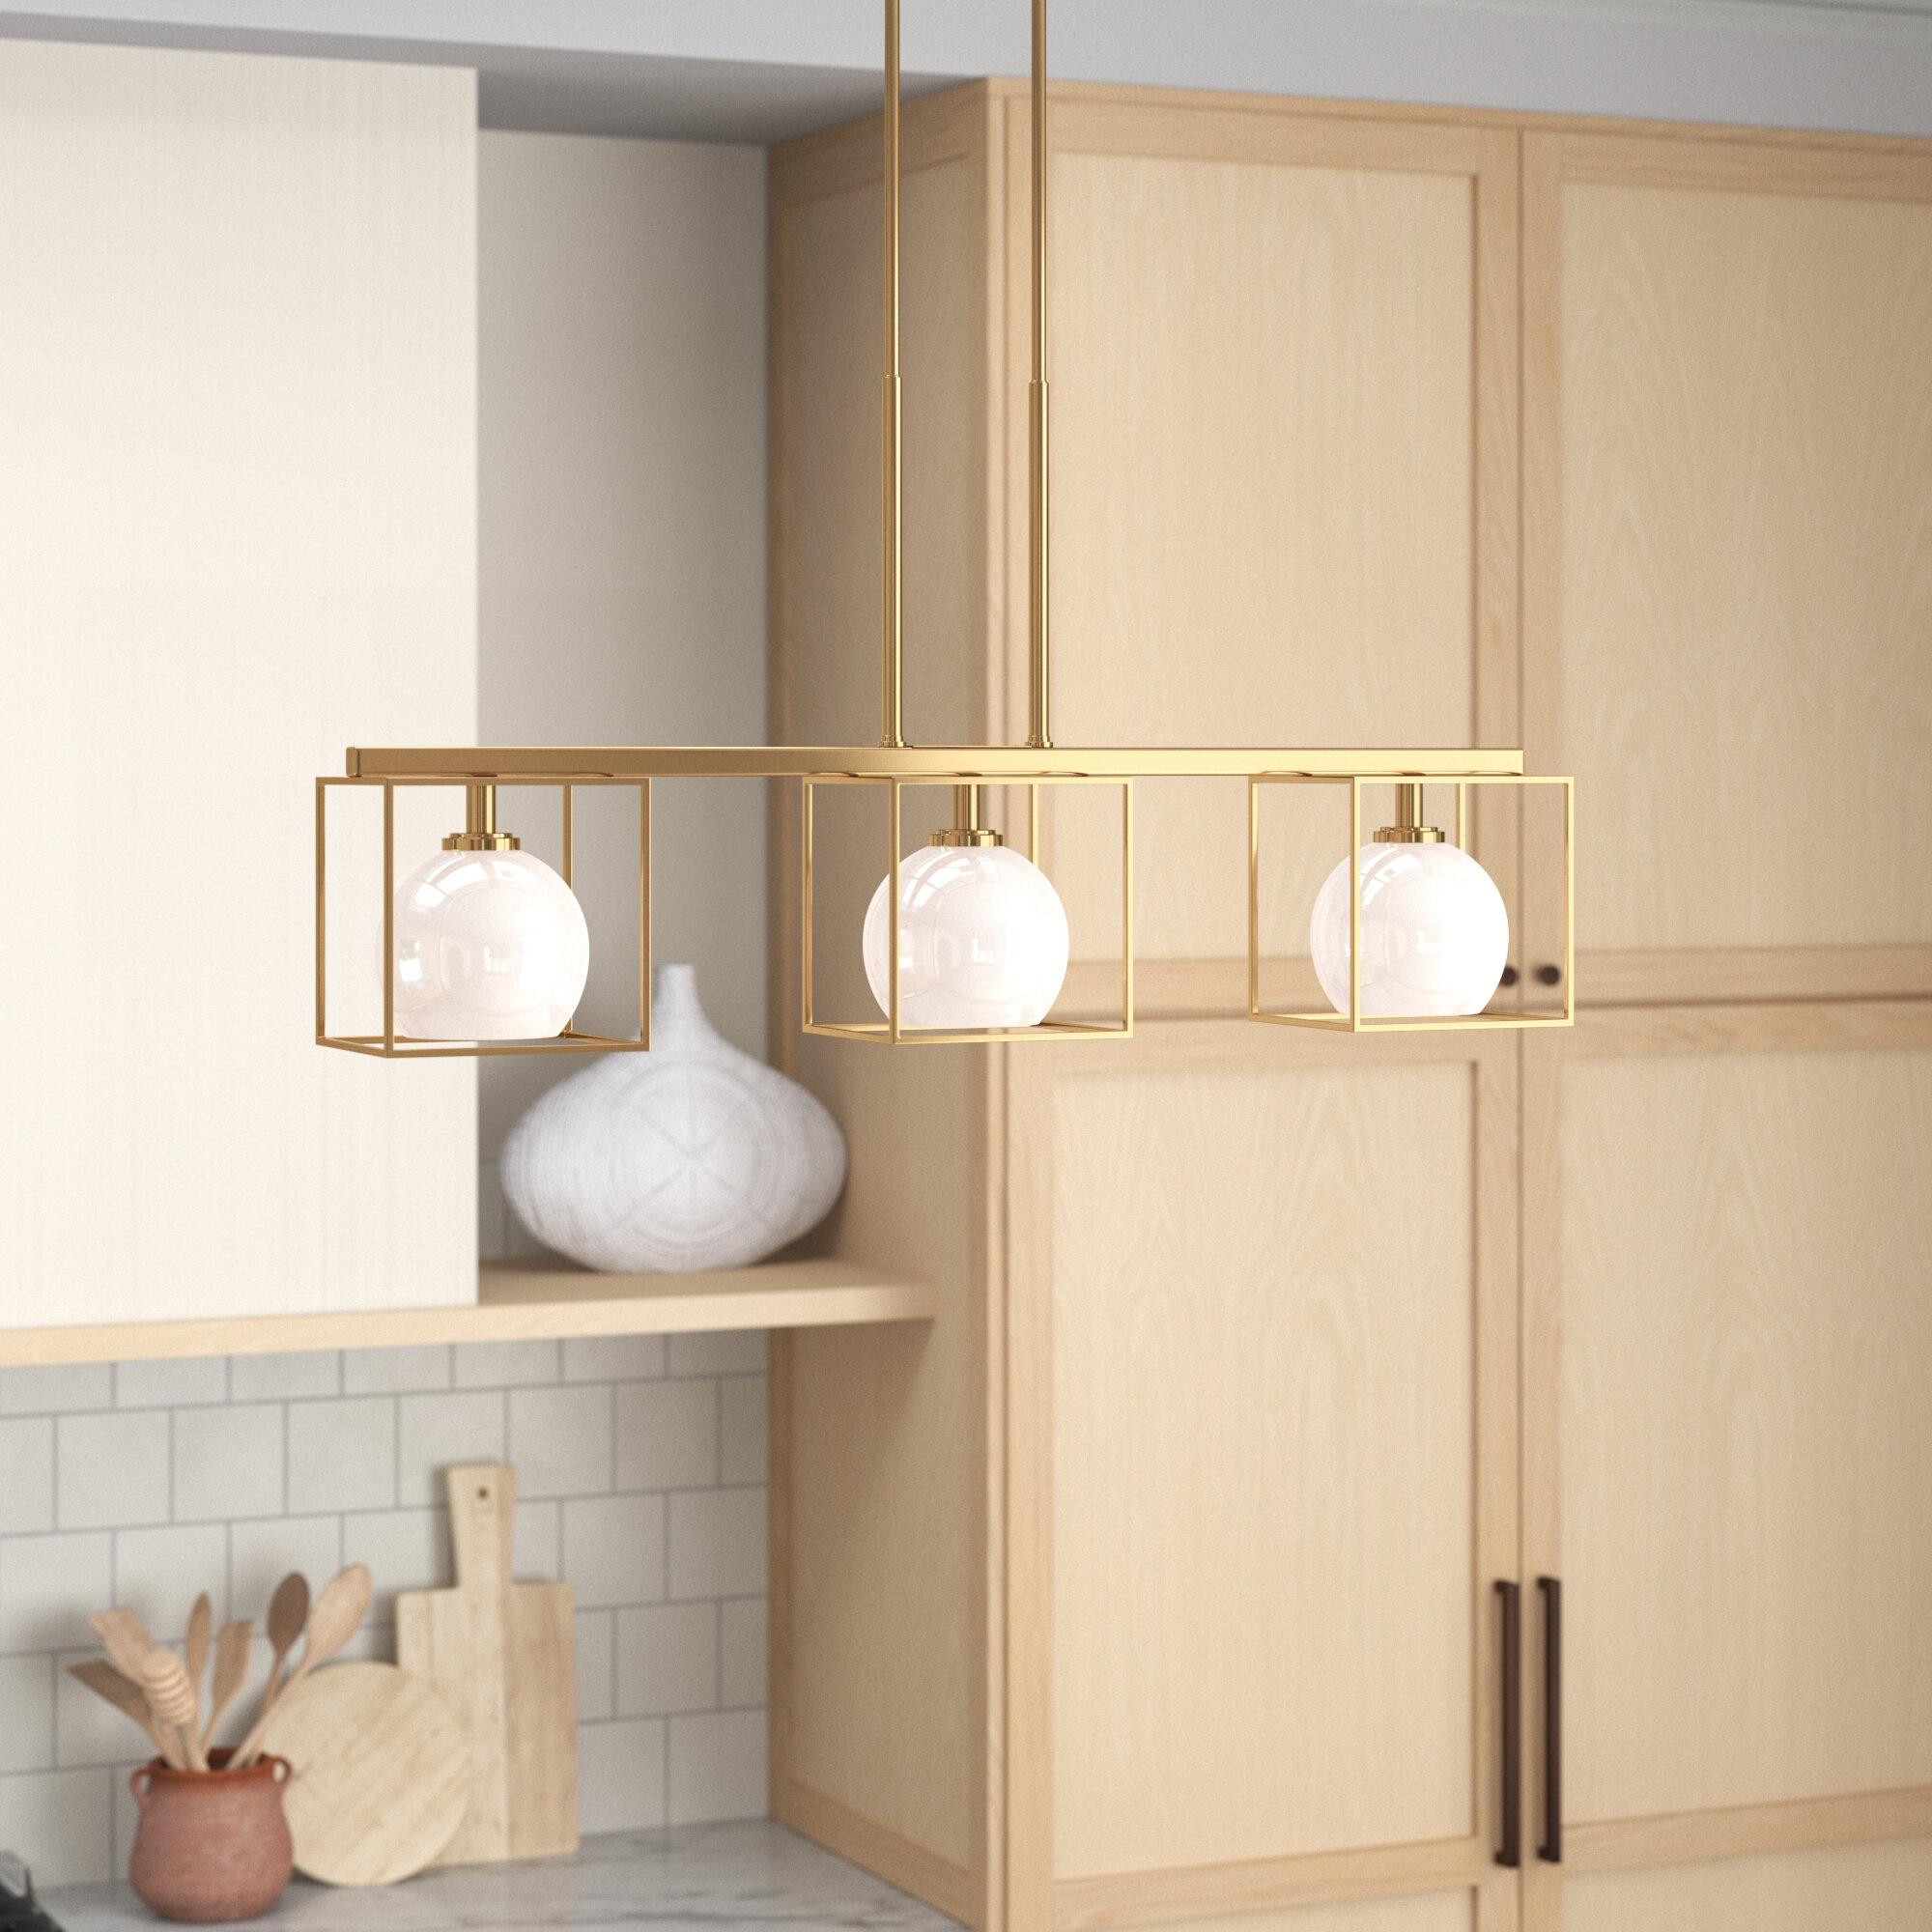 Yosef 3 Light Kitchen Island Linear Pendant Reviews Joss Main